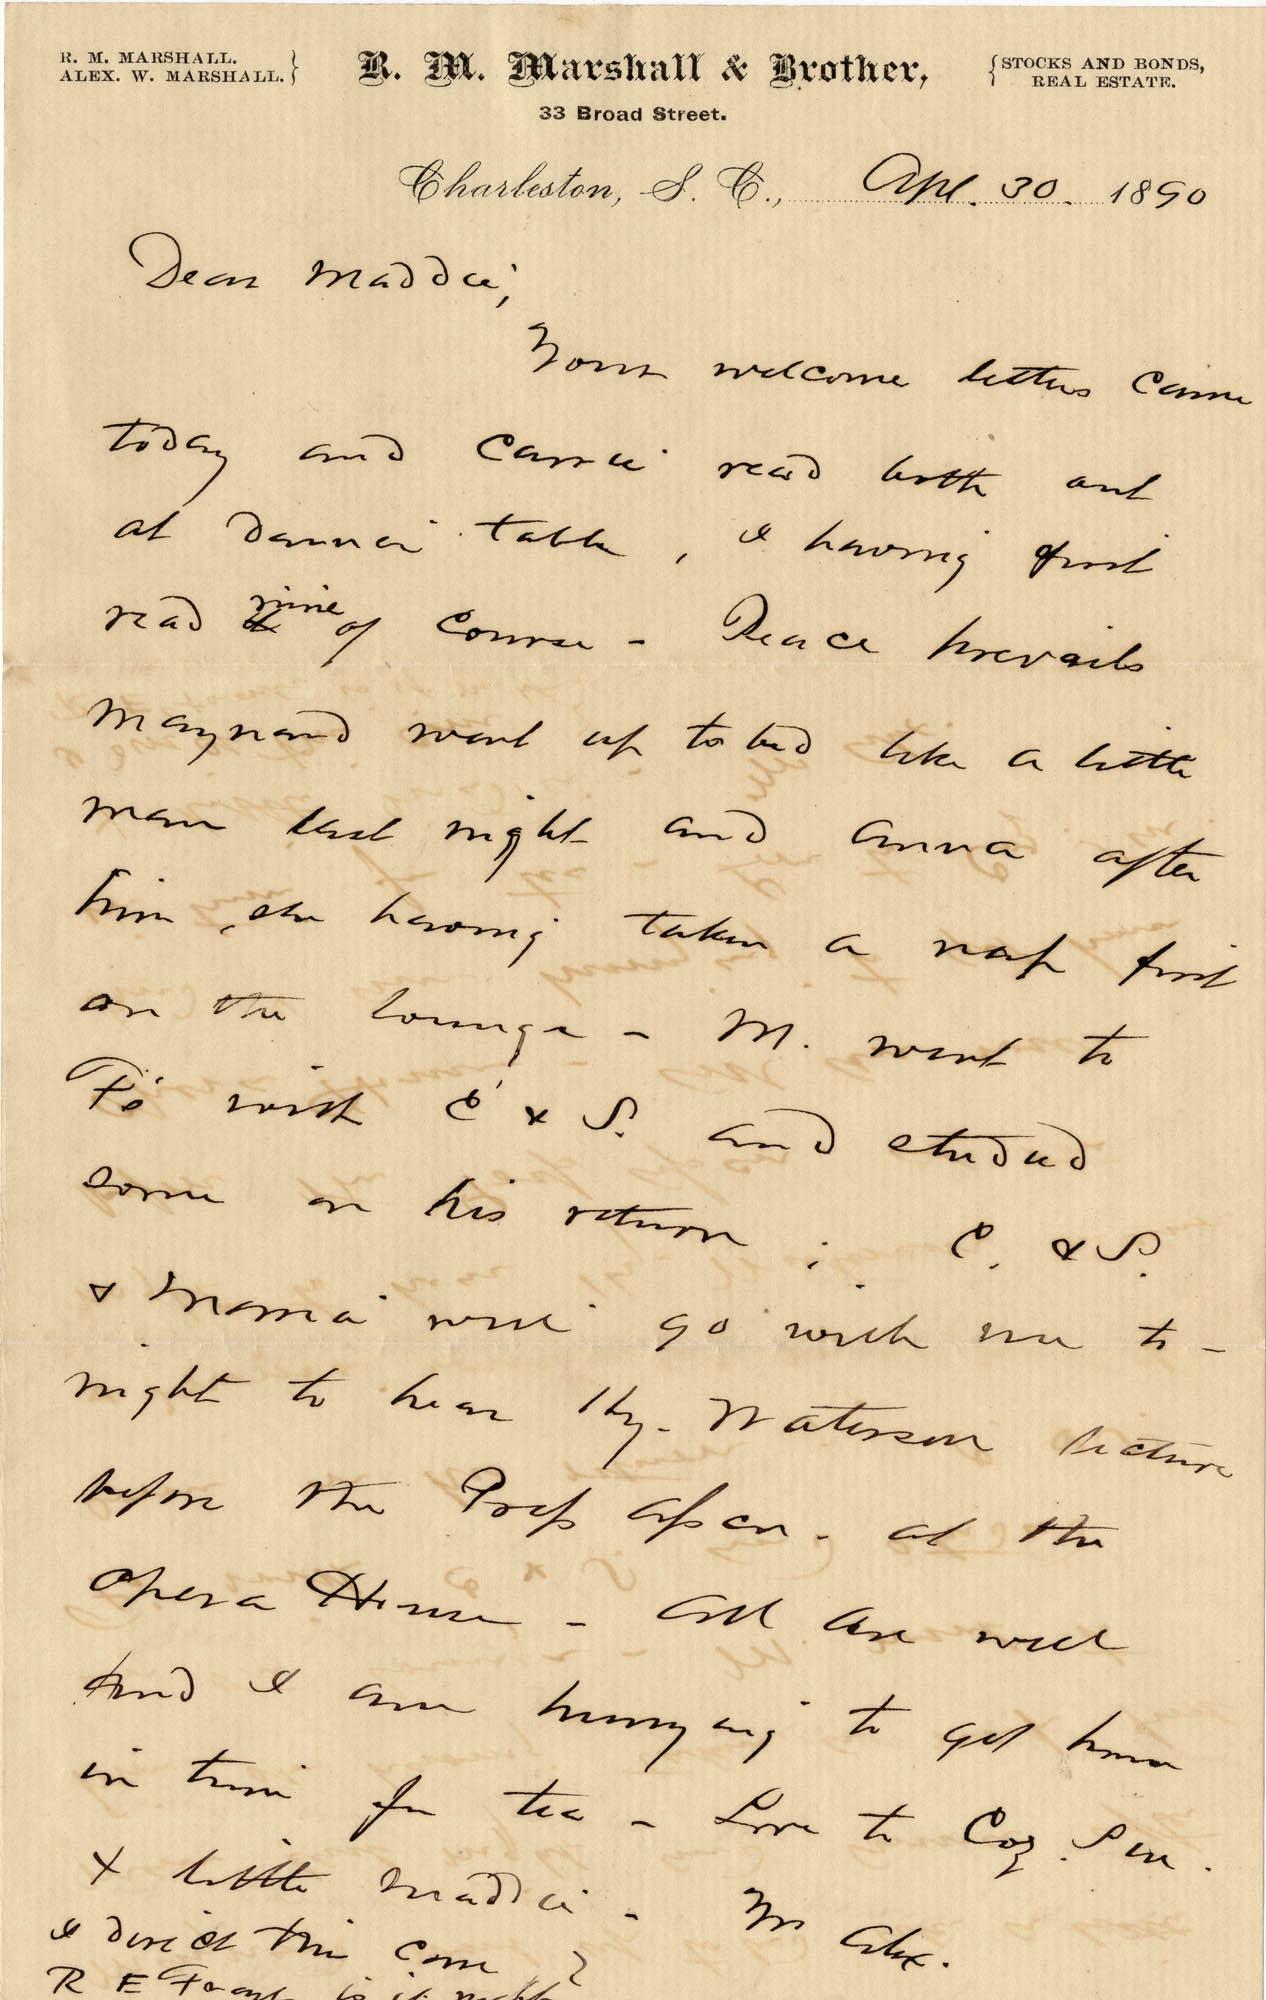 124. Alex Marshall to Magdalen Elizabeth Wilkinson Marshall (nee Keith) -- Apr. 30, 1890